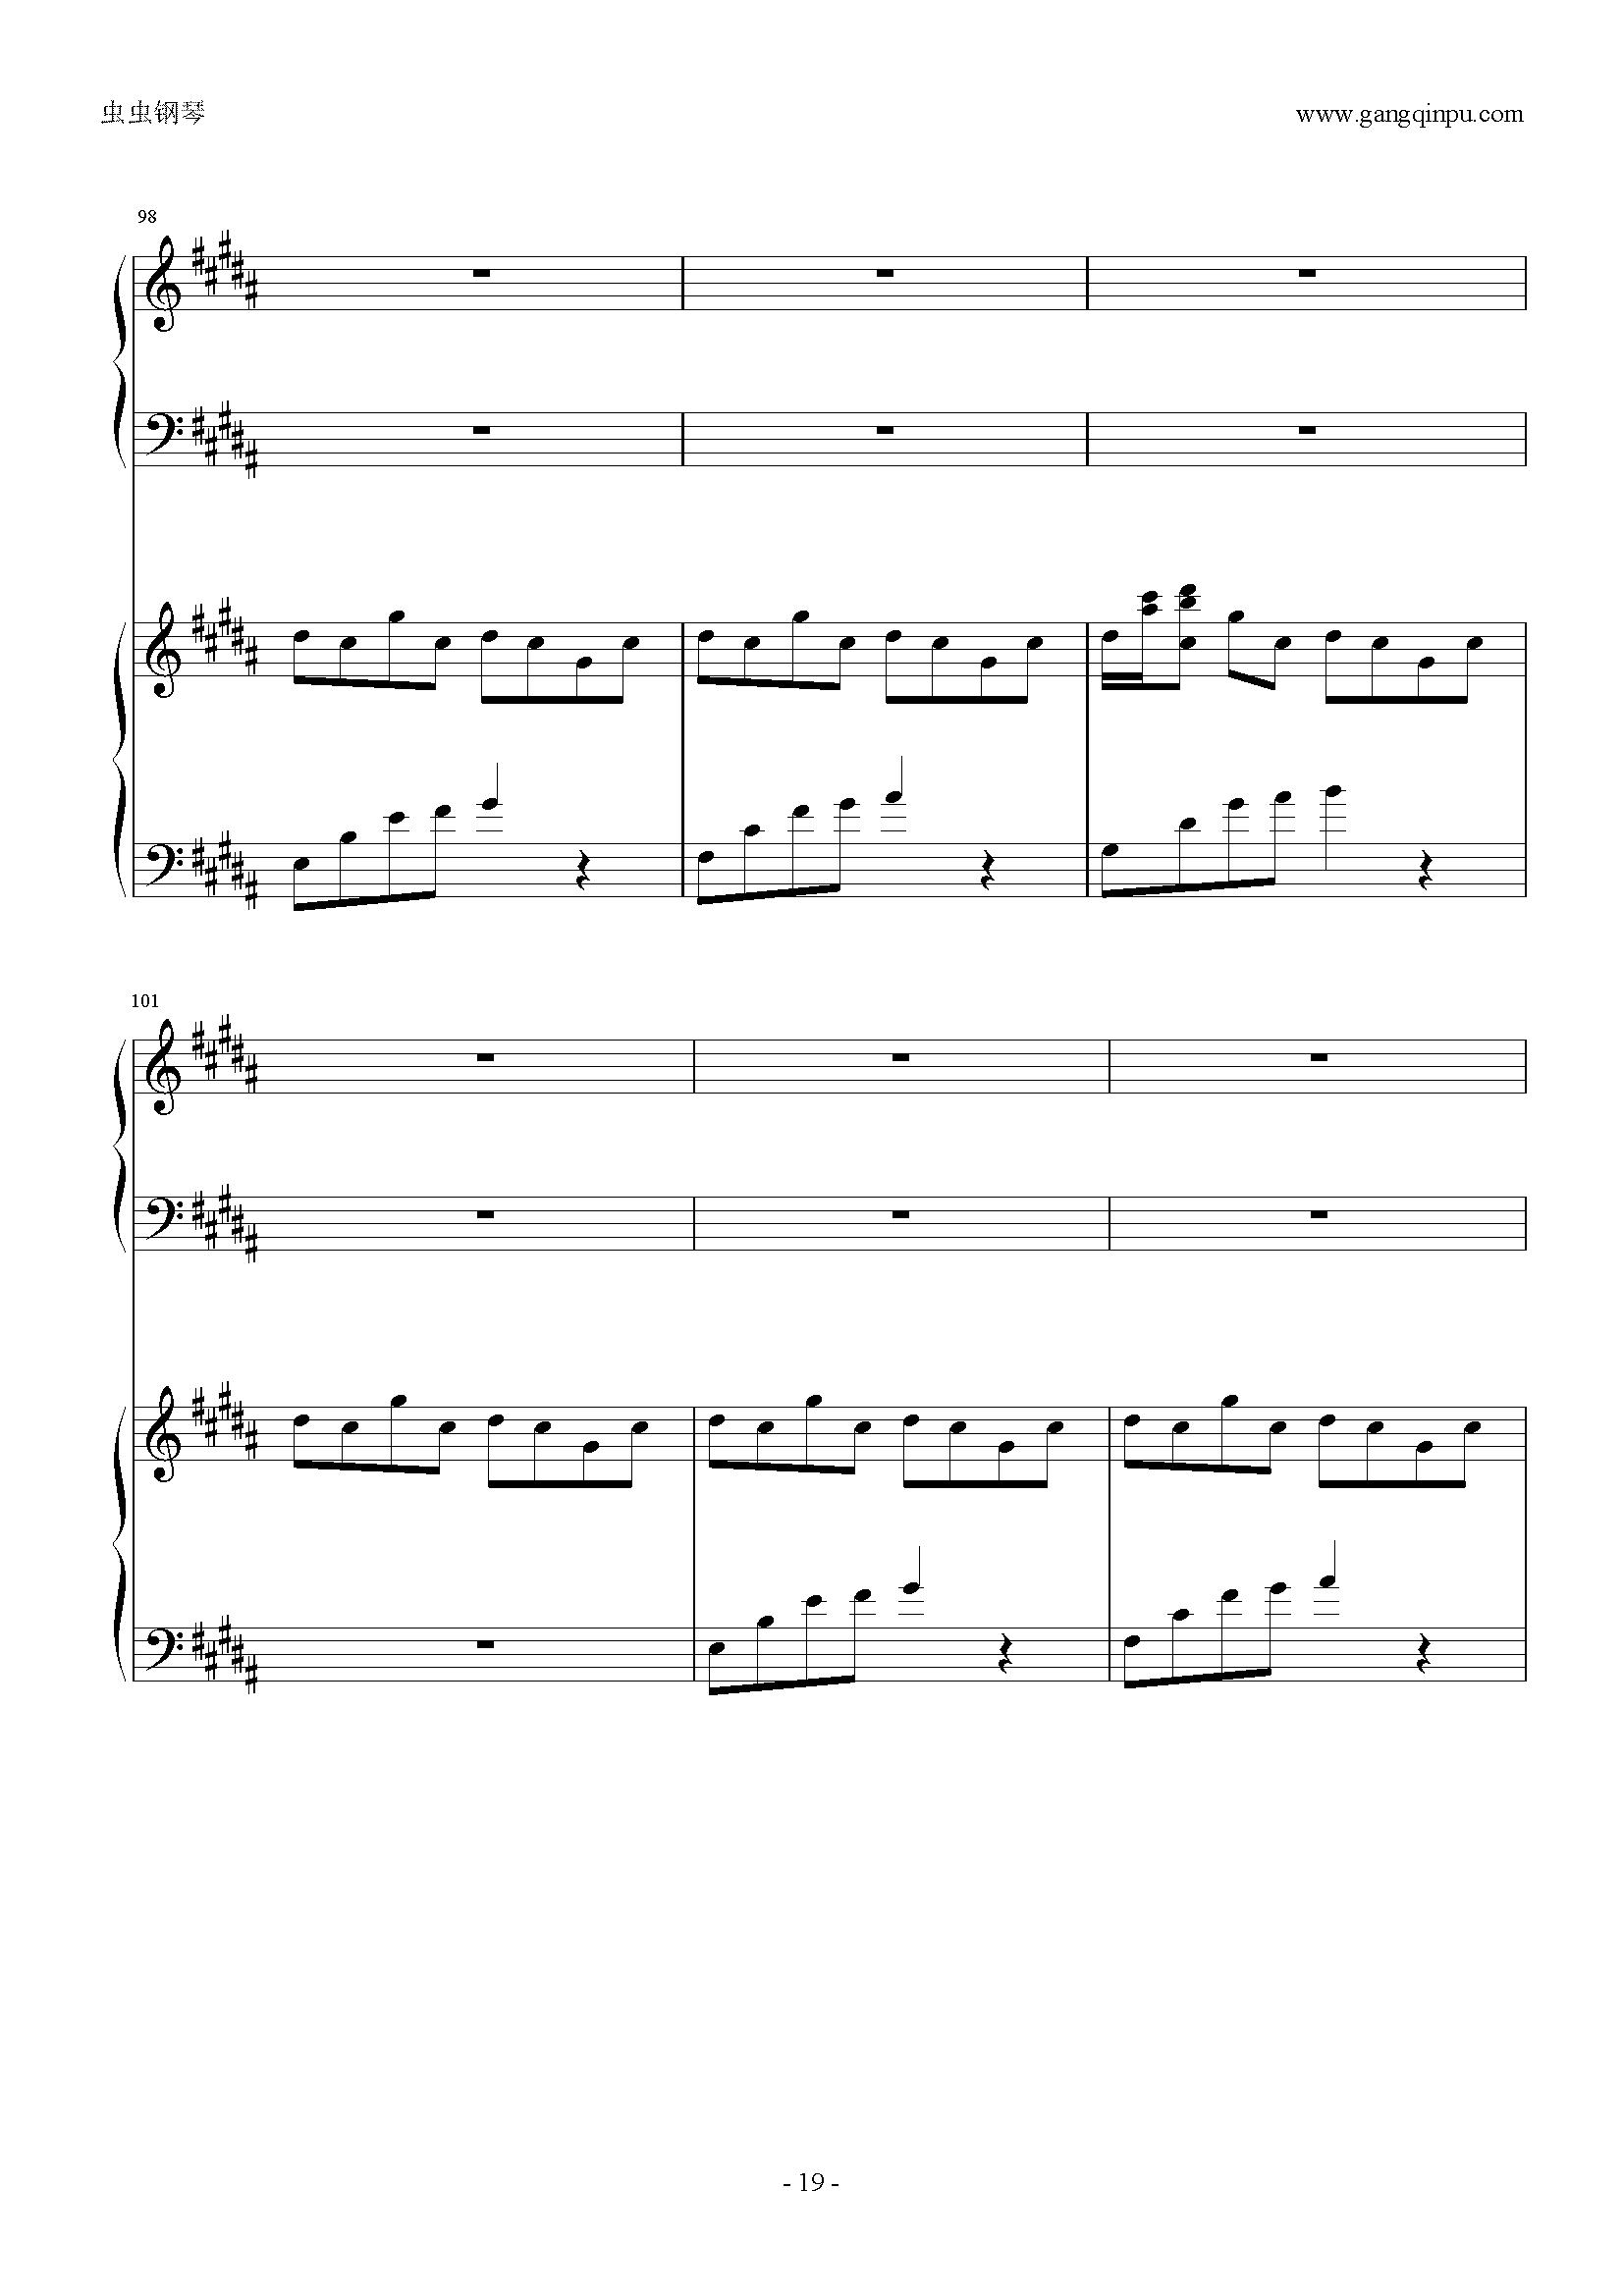 fiover dance钢琴简谱